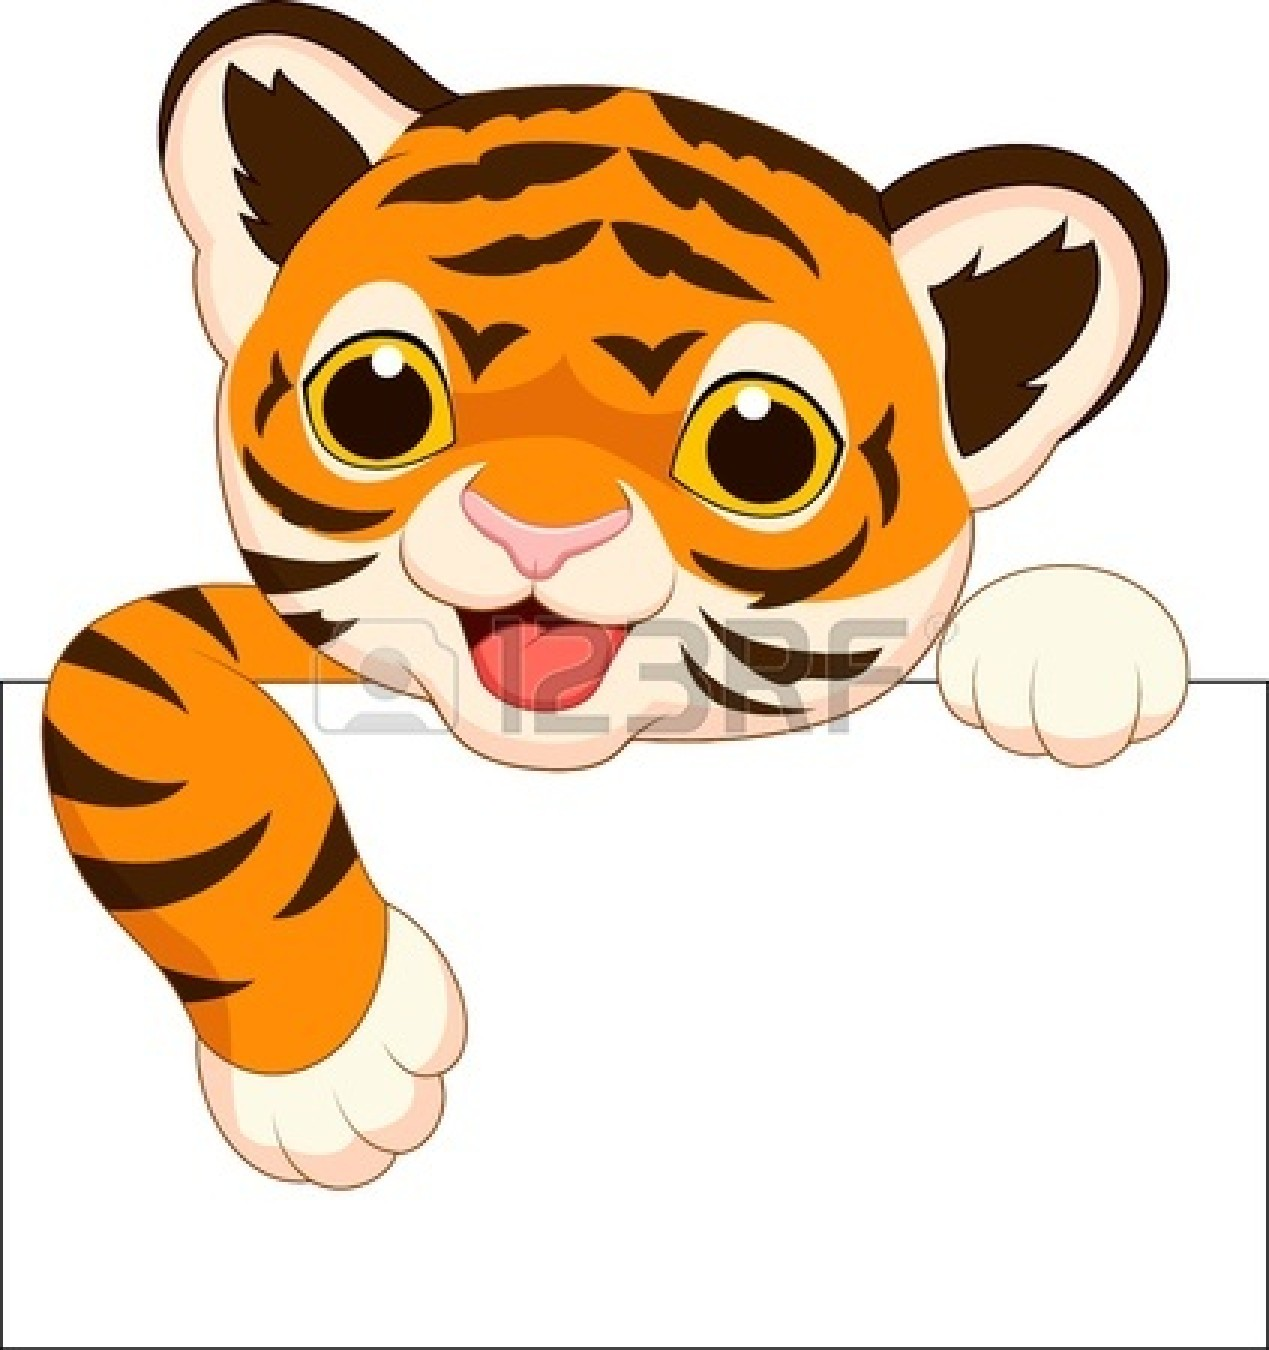 Baby Tiger Clipart at GetDrawings.com.